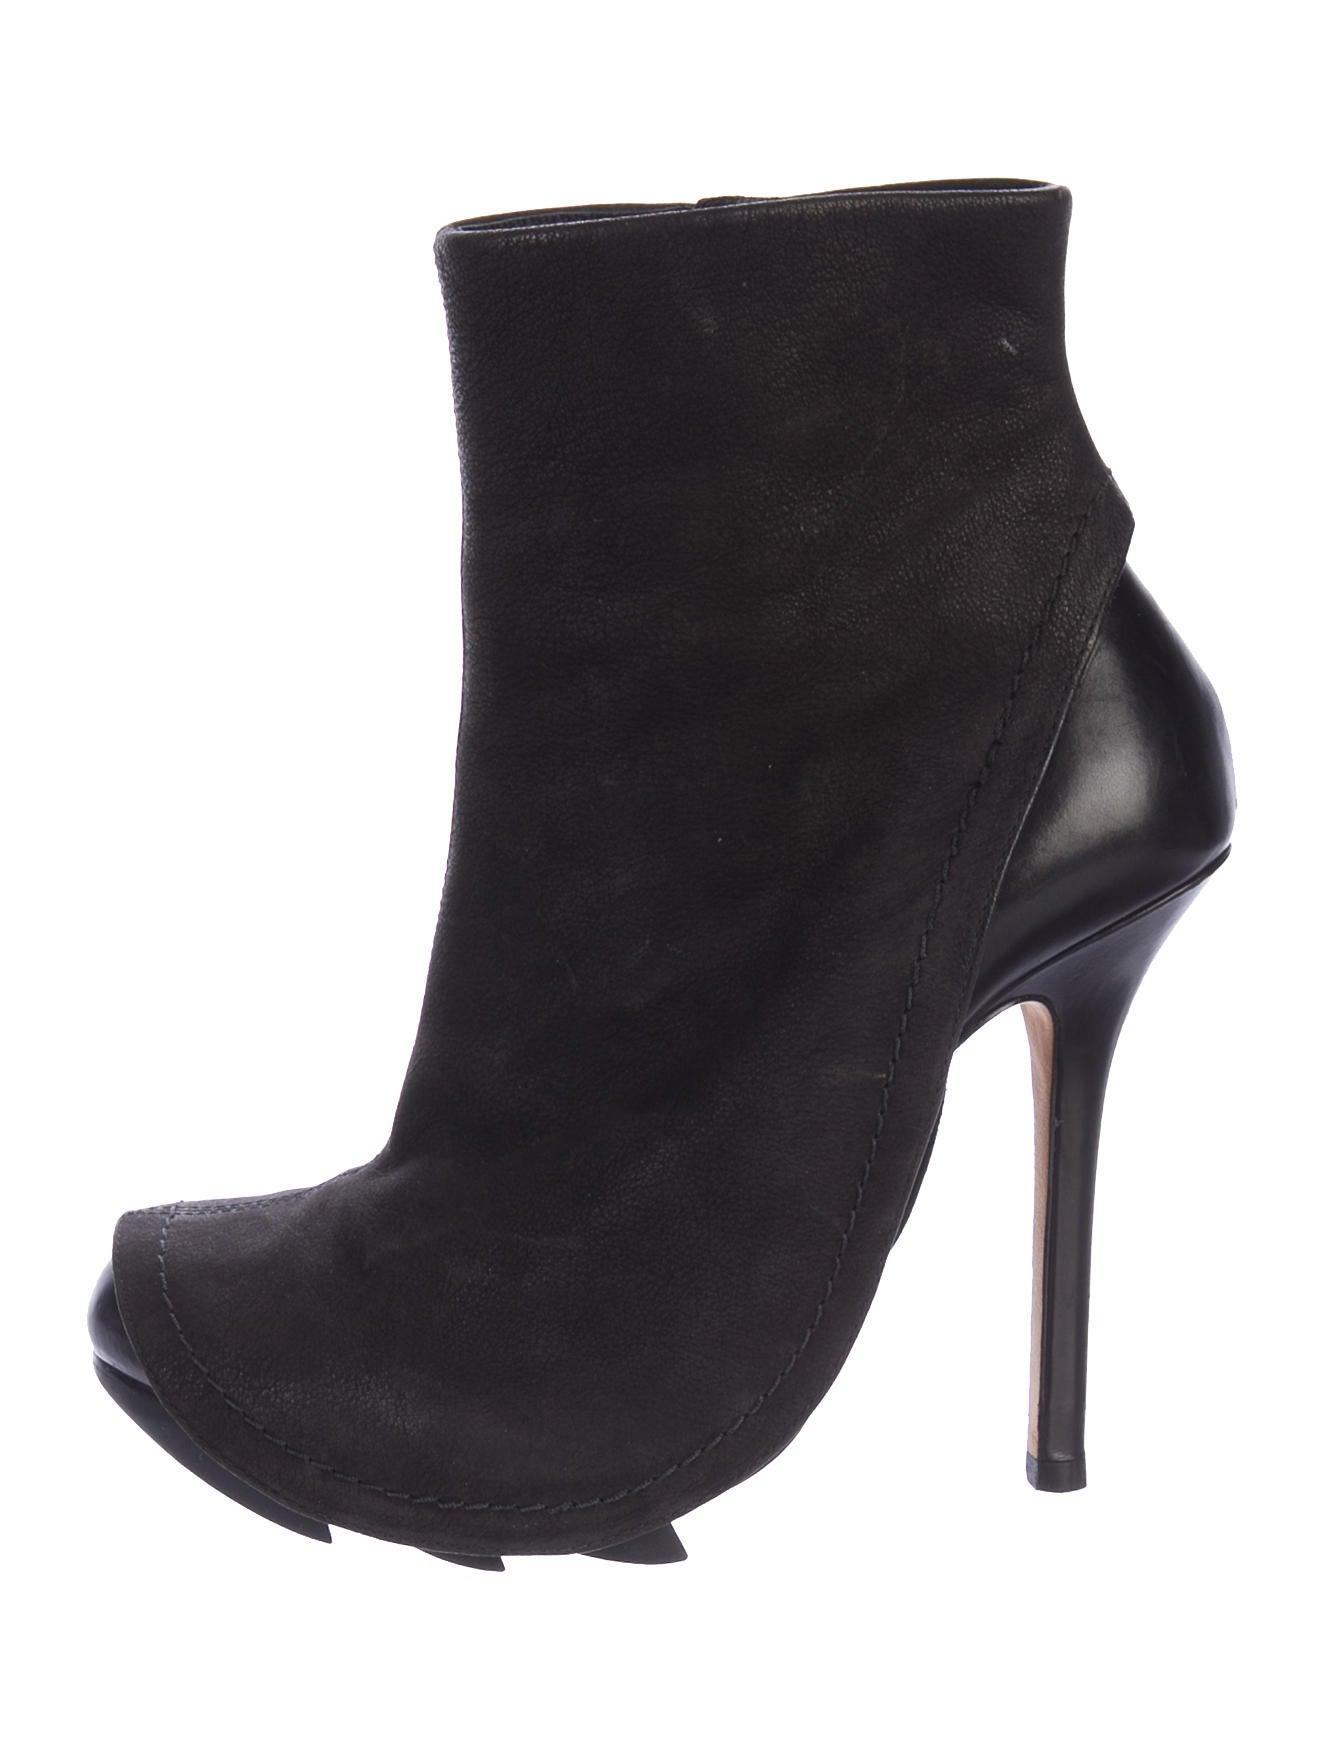 Camilla Skovgaard Drape Platform Ankle Boots cheap sale shop HxxubjfbM